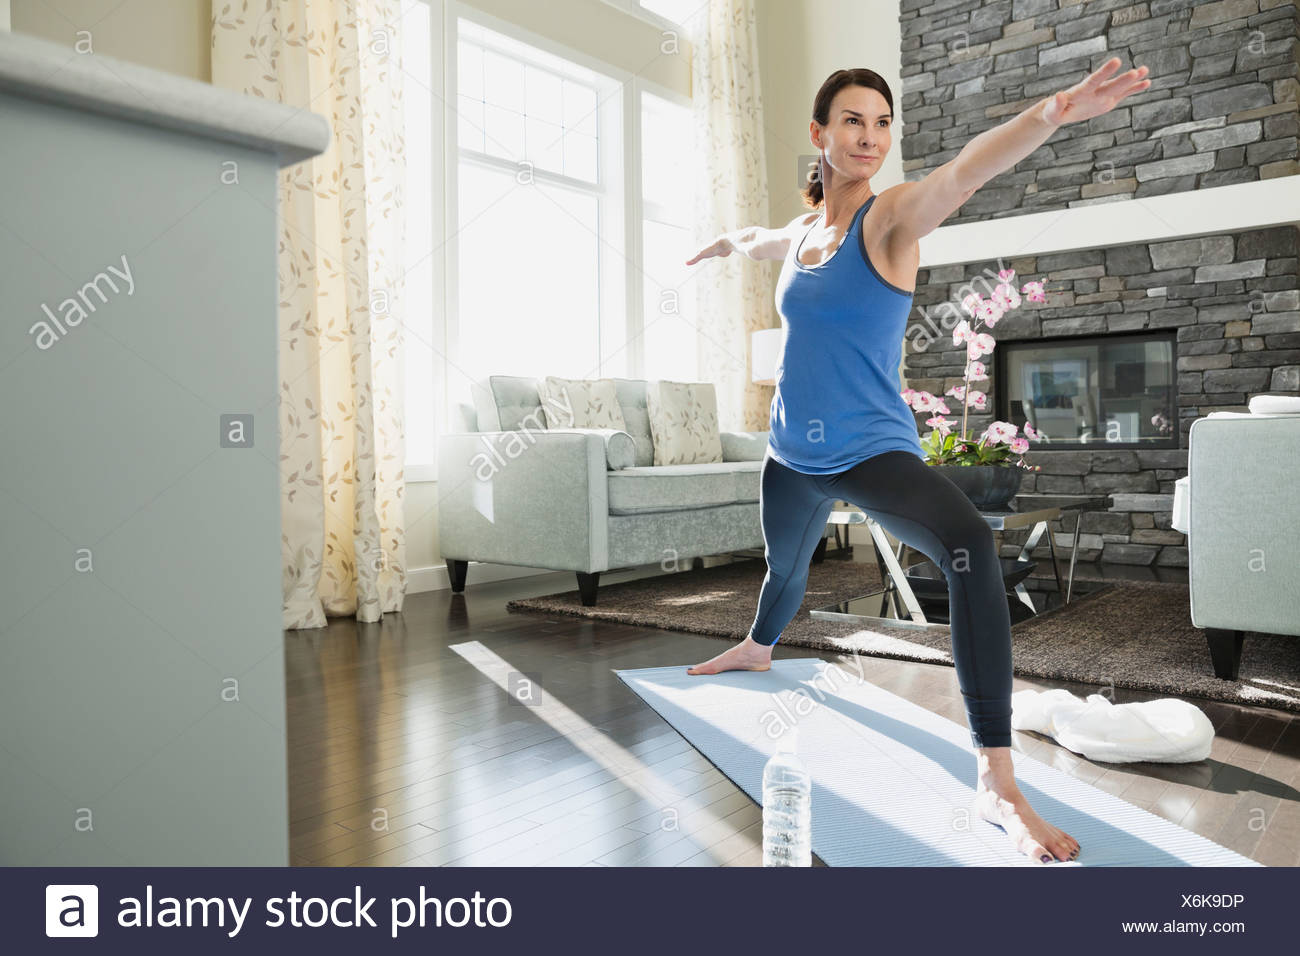 Reife Frau erstreckt sich auf Yoga-Matte Stockbild